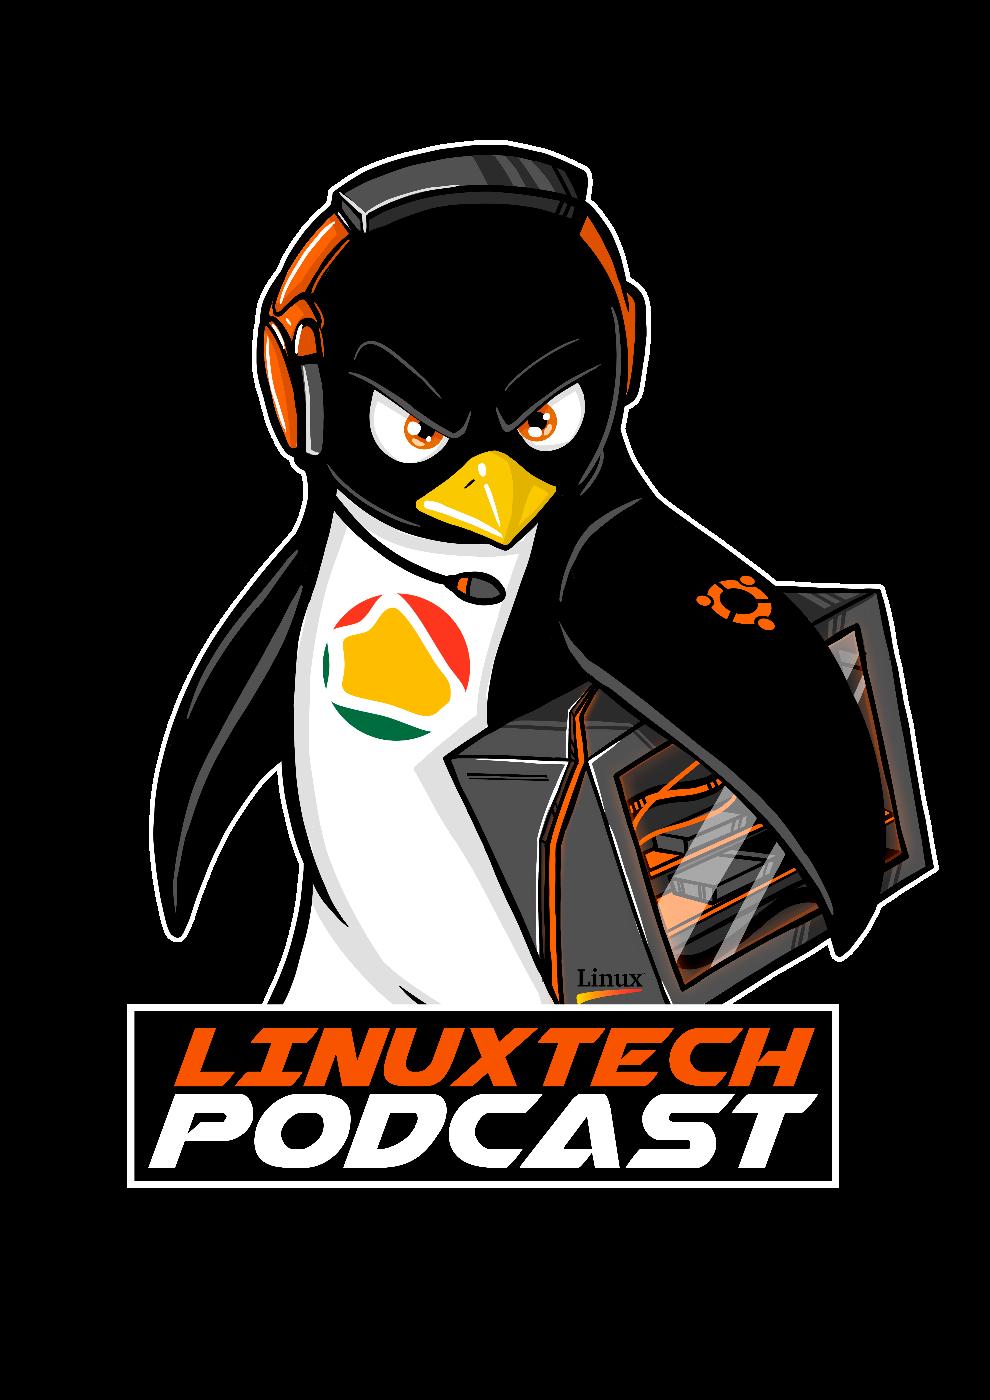 Linuxtech Podcast show art